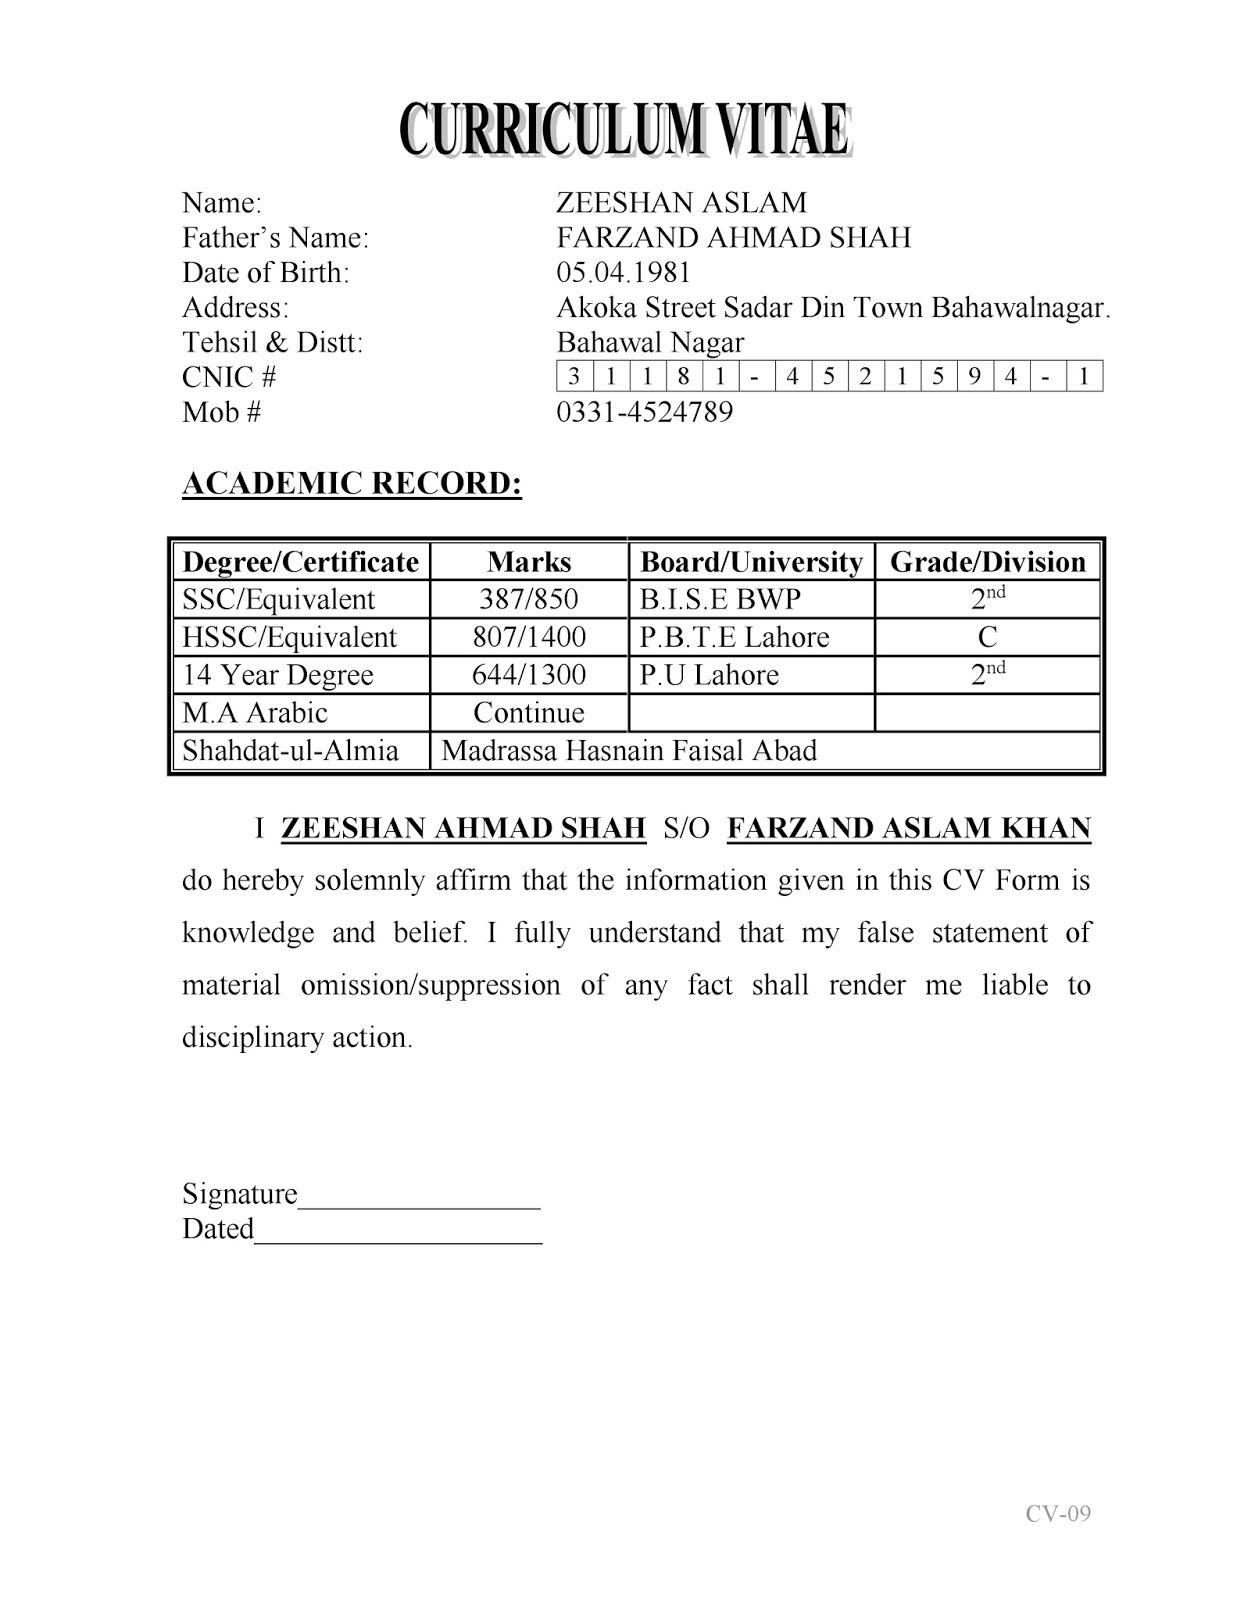 Curriculum Vitae Cv Sample 09 Zmcrc Zia Bwn